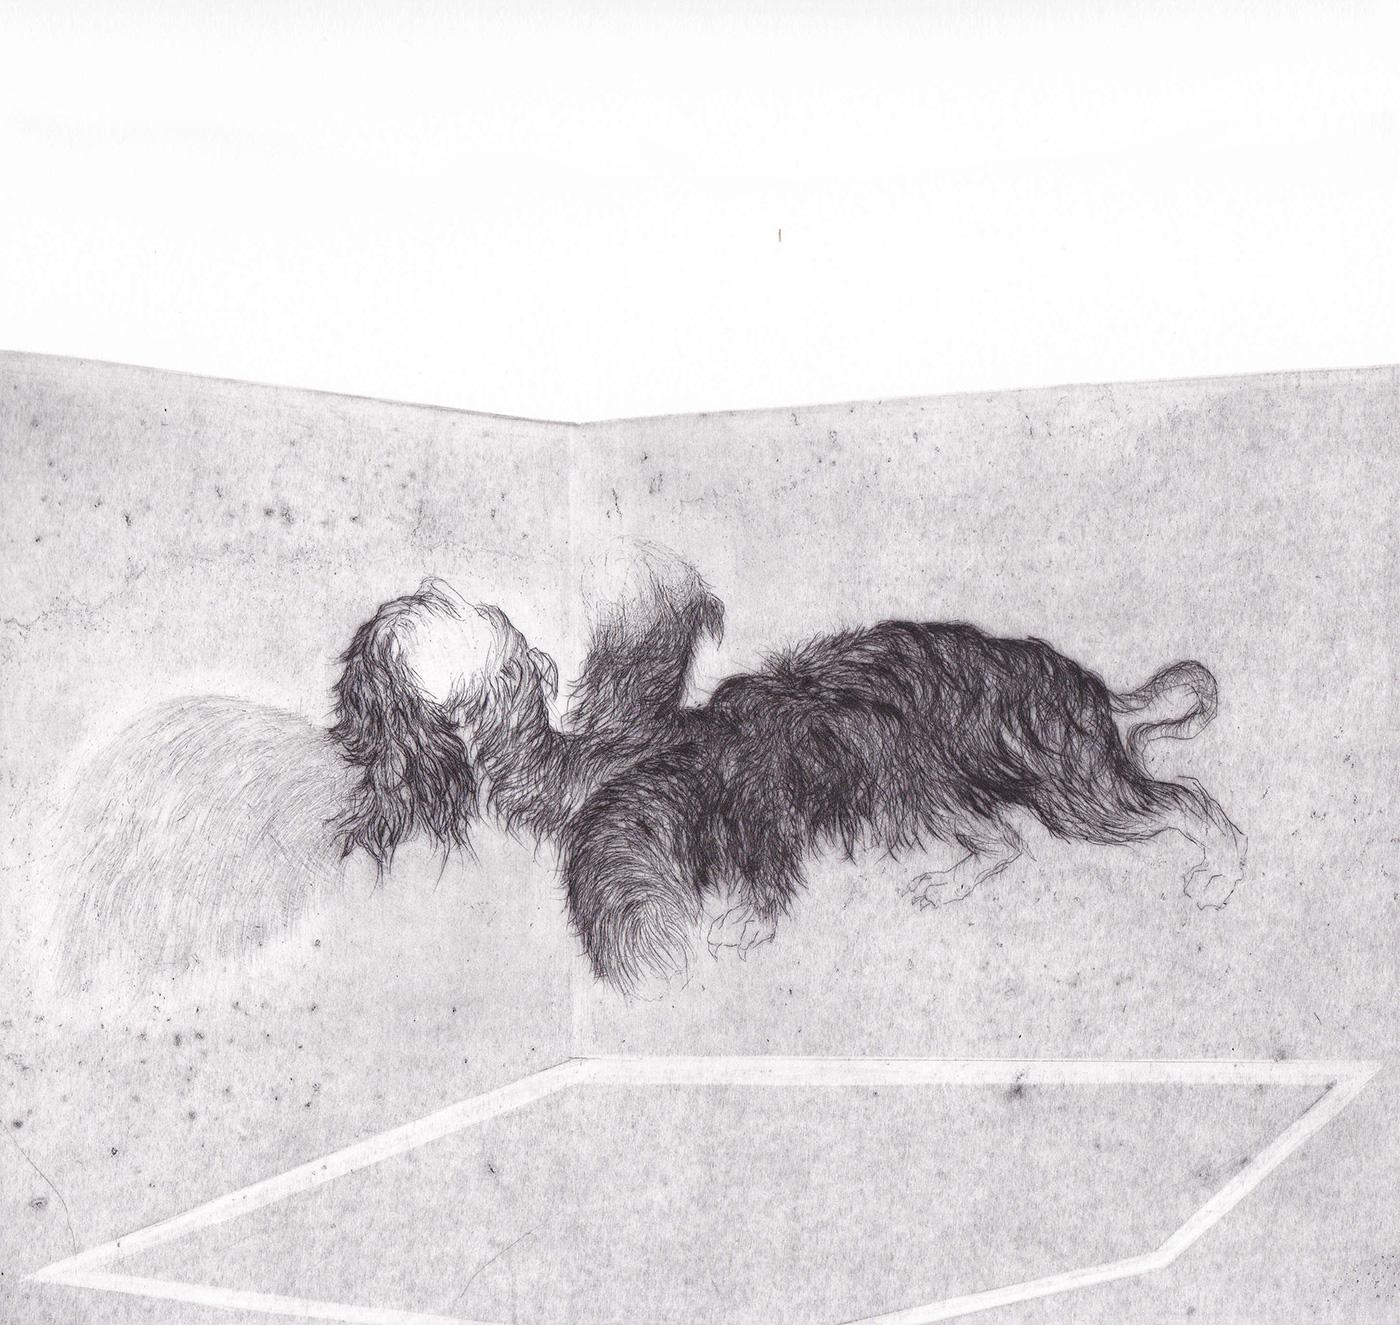 <i>Ombre</i>, édition encrage alma, 2016 - gravure, pointe sèche